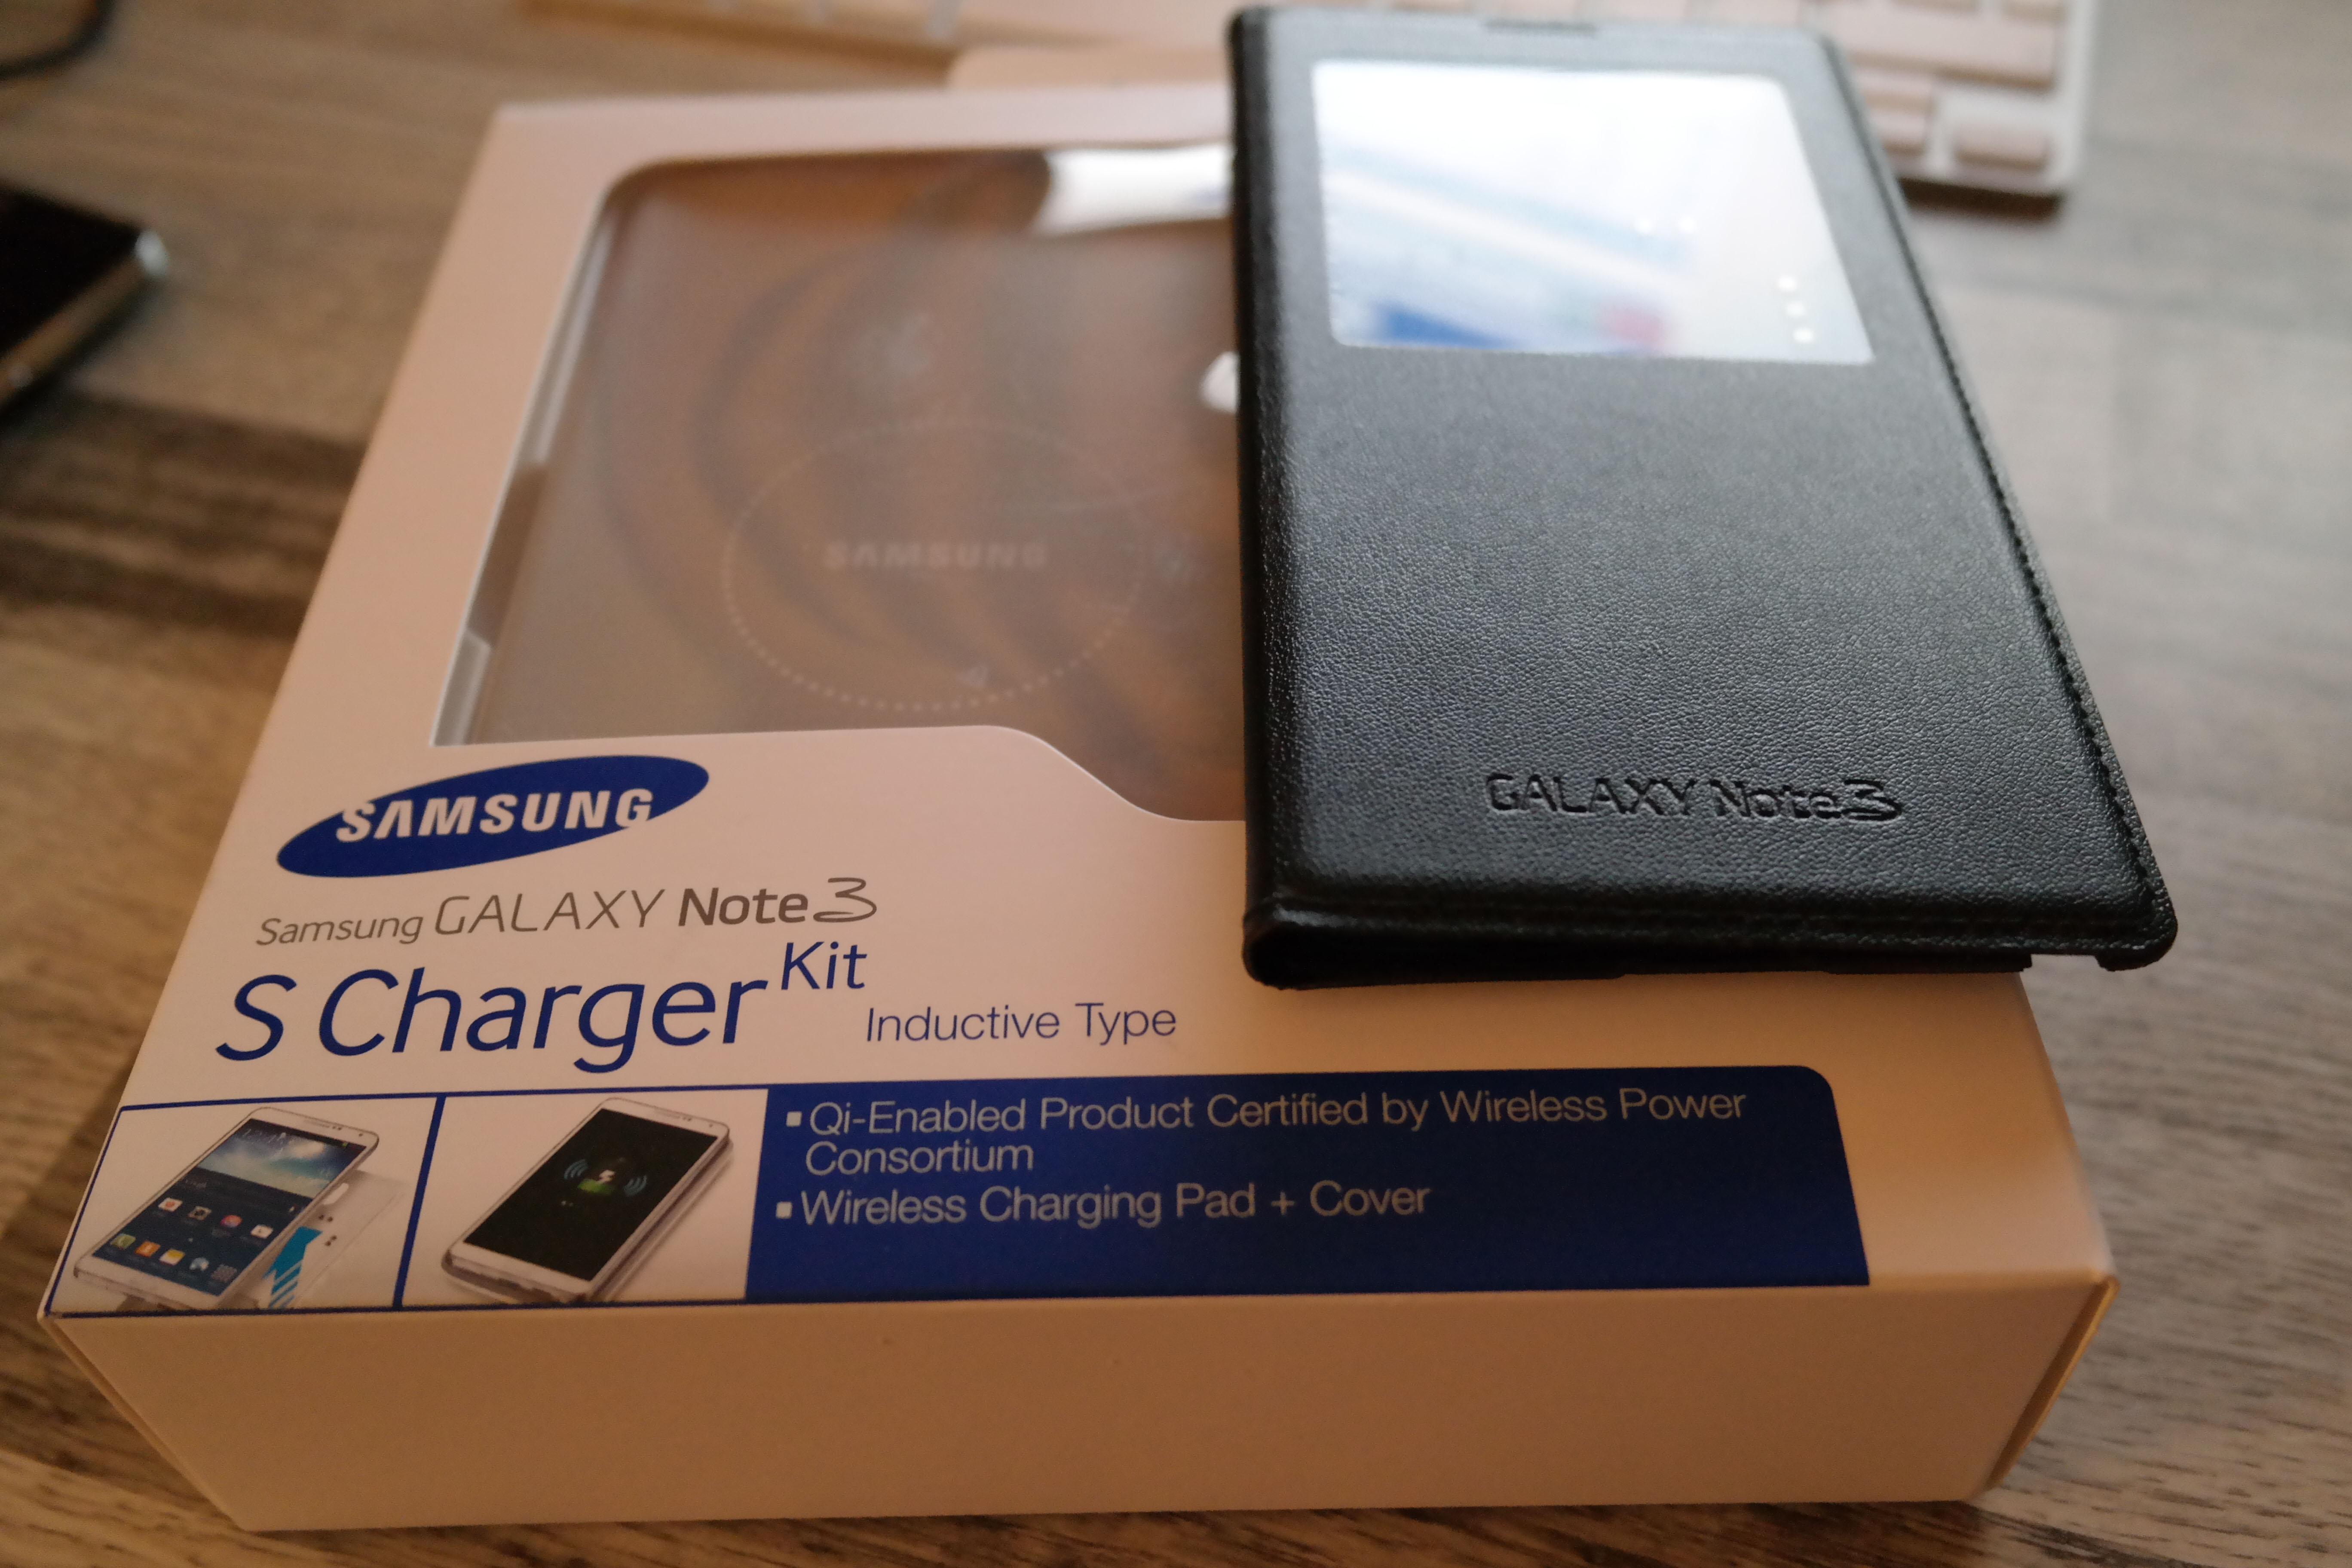 xS charger kit.jpg